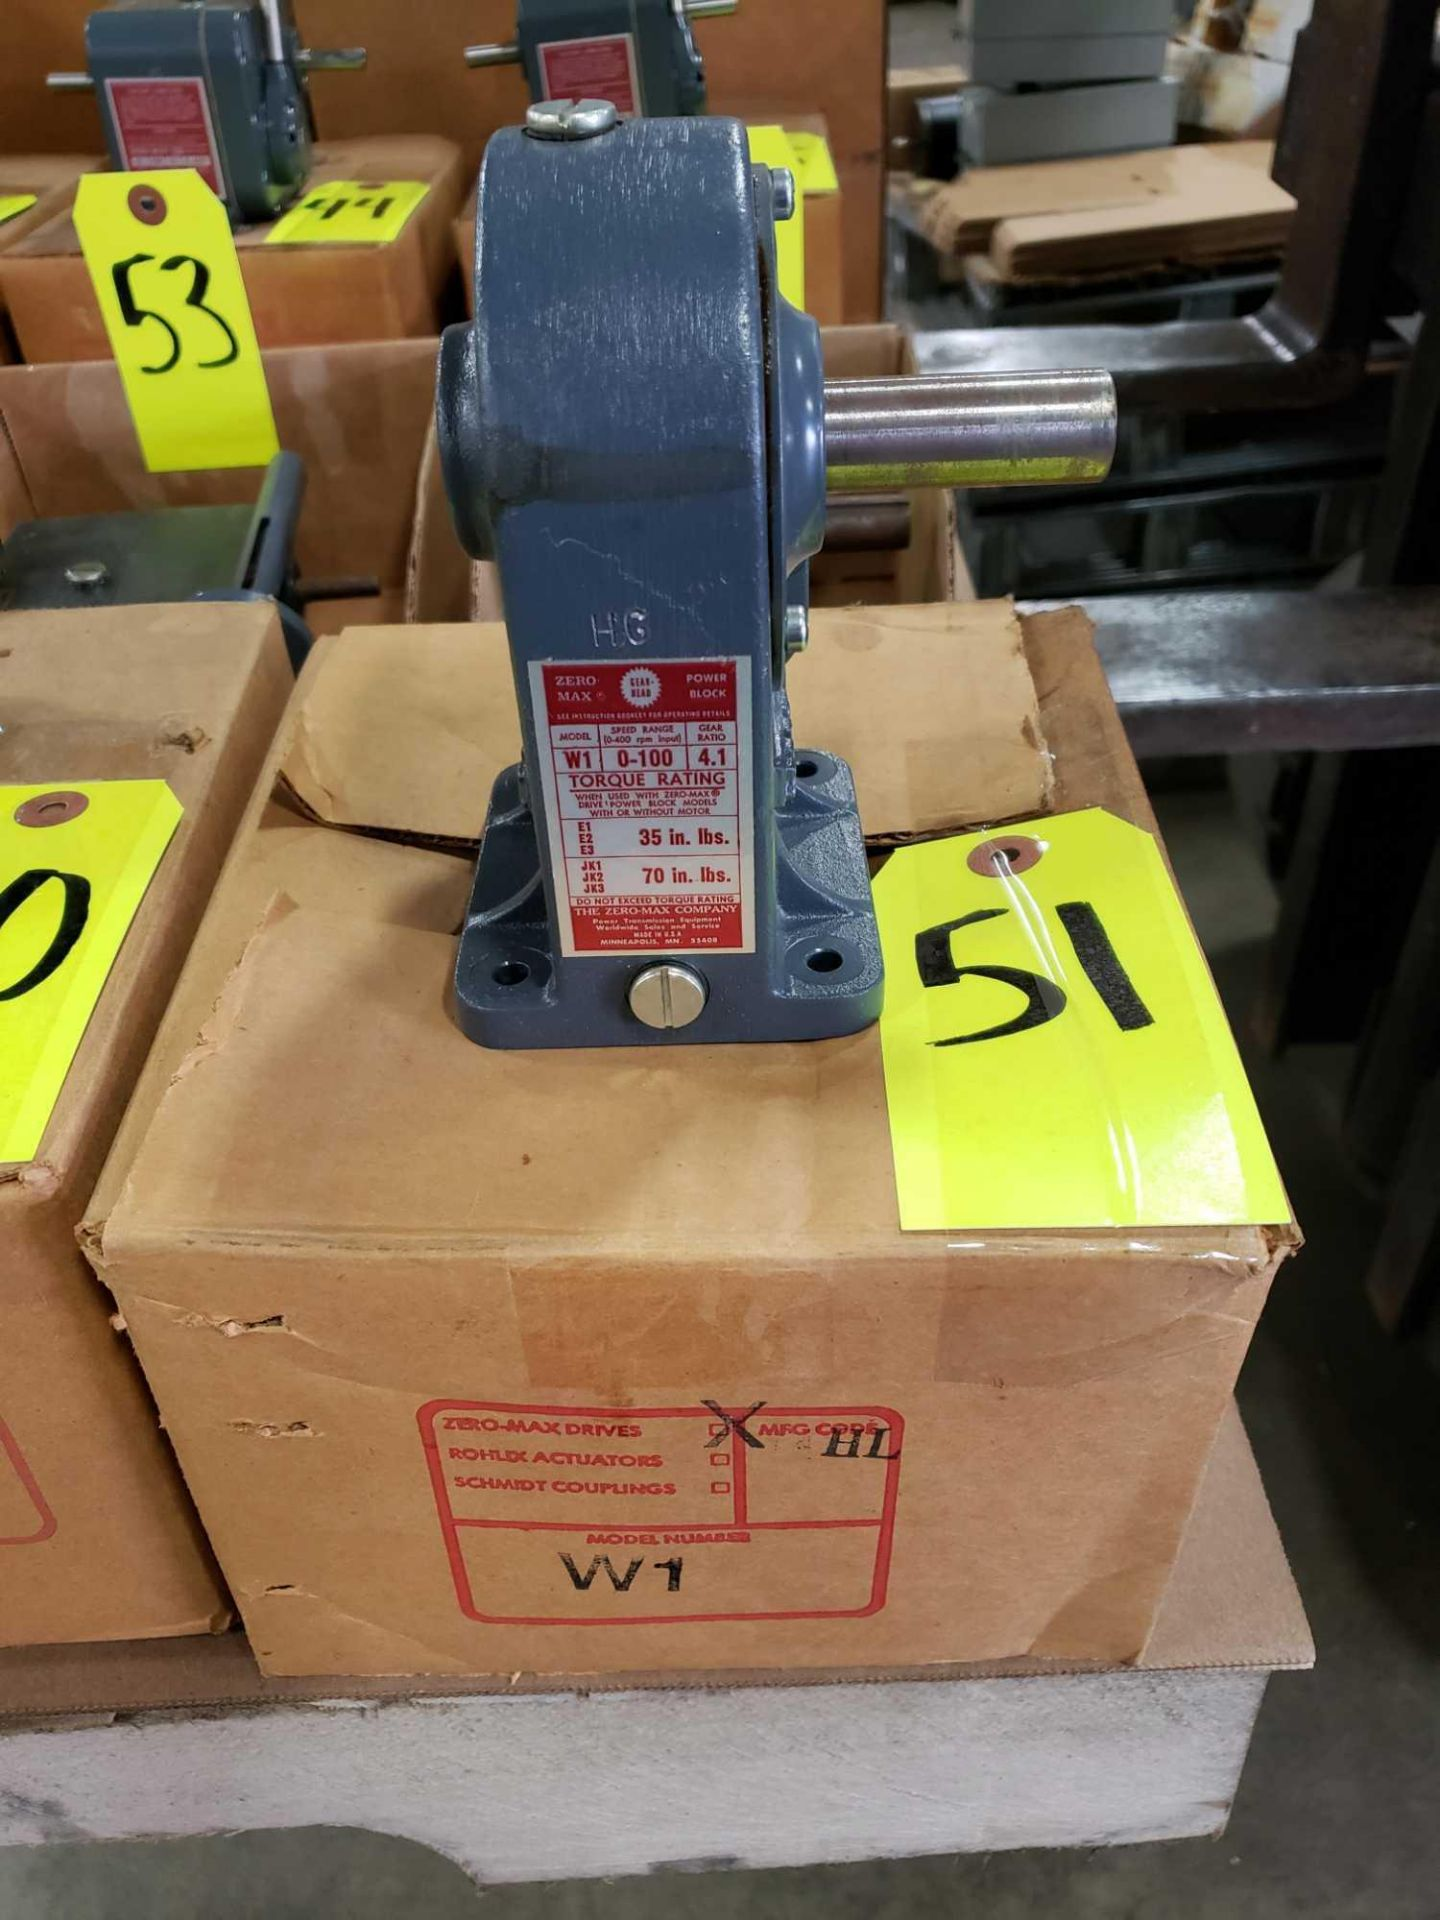 Lot 51 - Zero-max gearhead power block model W1 speed range 0-100, gear ratio 4:1. New in box.